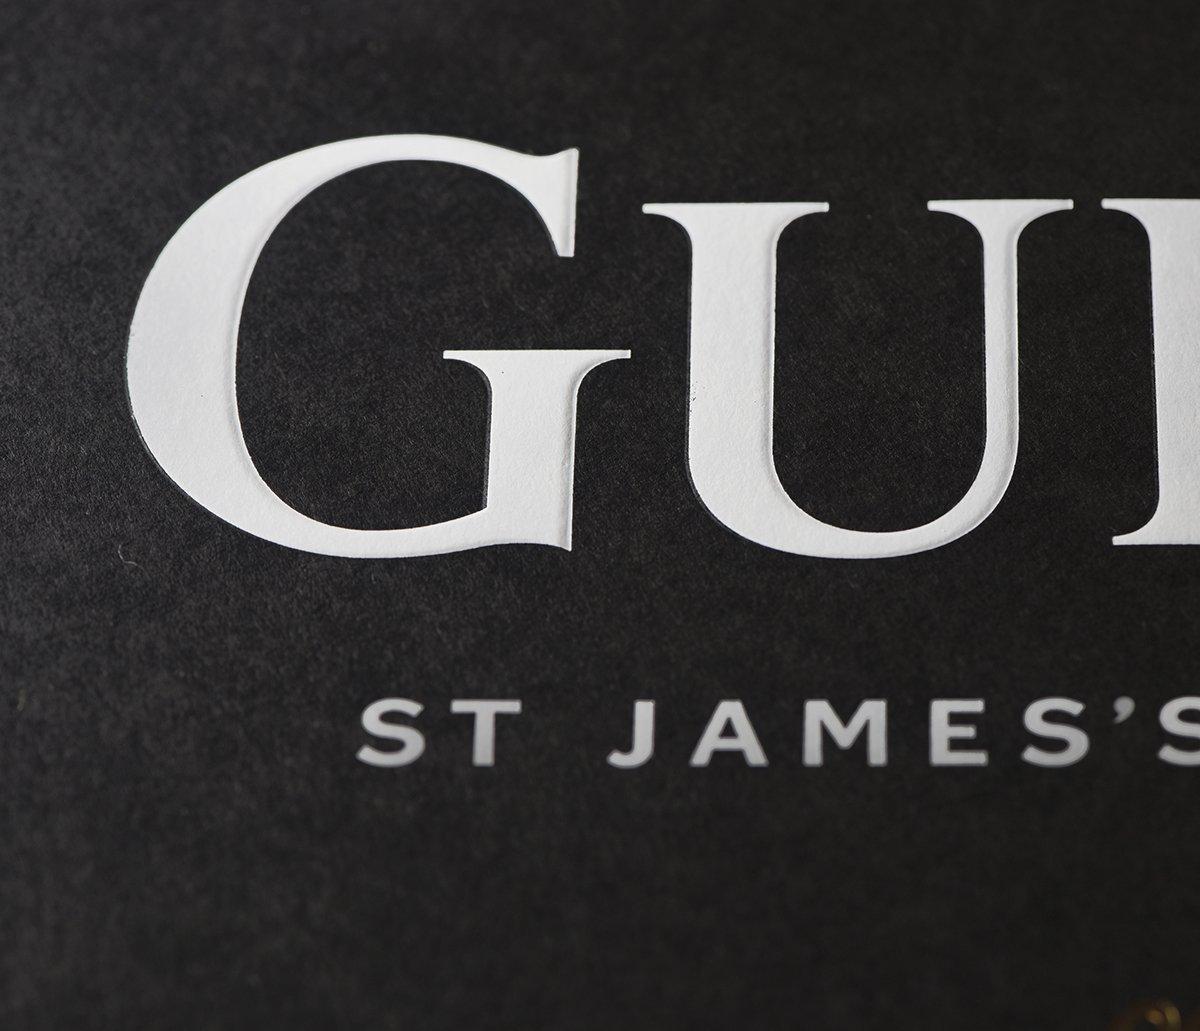 Guinness-identity-6-St-James